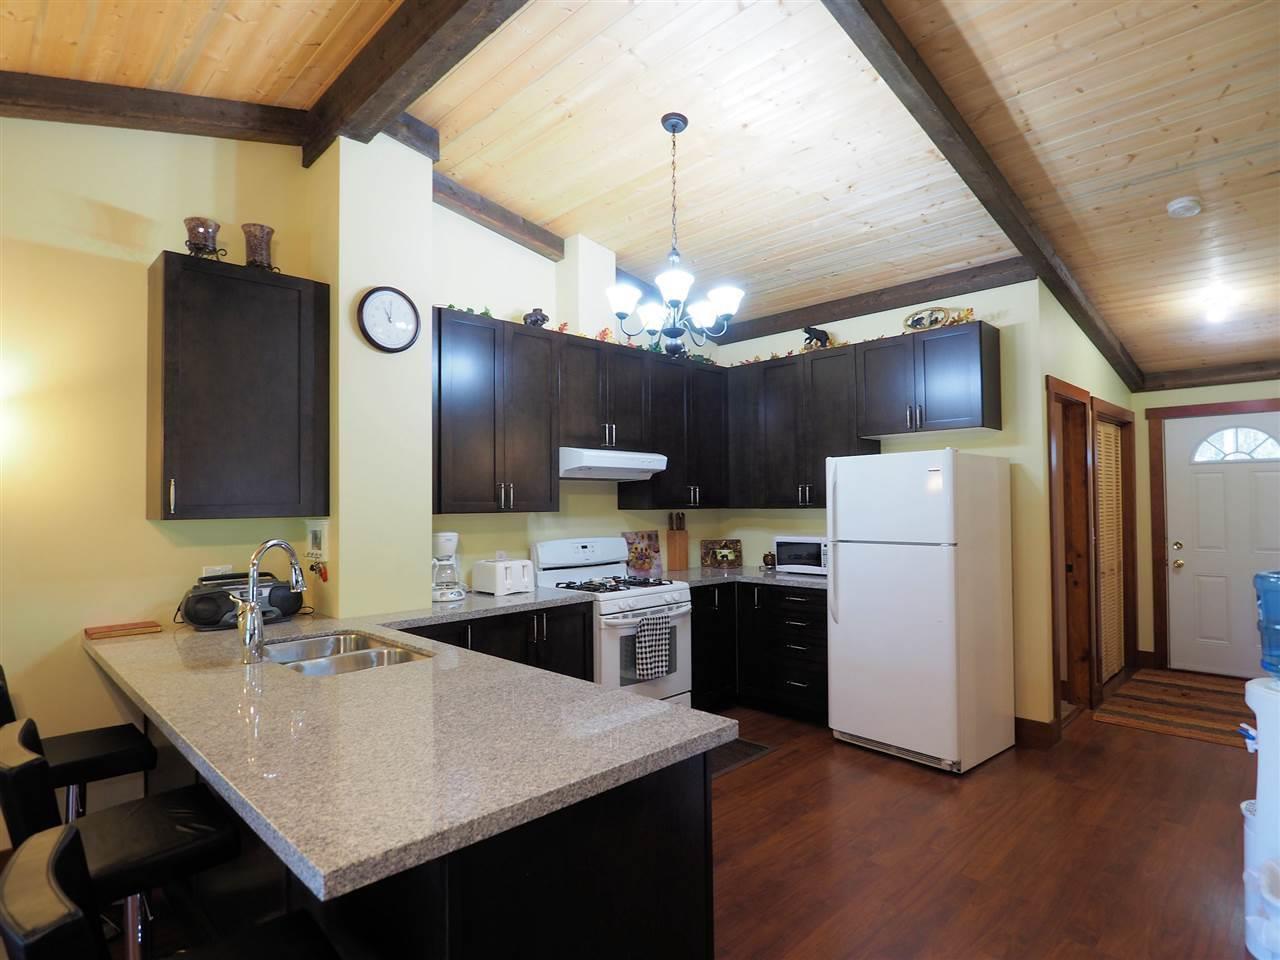 Photo 18: Photos: 8222 CENTENNIAL Road in Bridge Lake: Bridge Lake/Sheridan Lake House for sale (100 Mile House (Zone 10))  : MLS®# R2457362